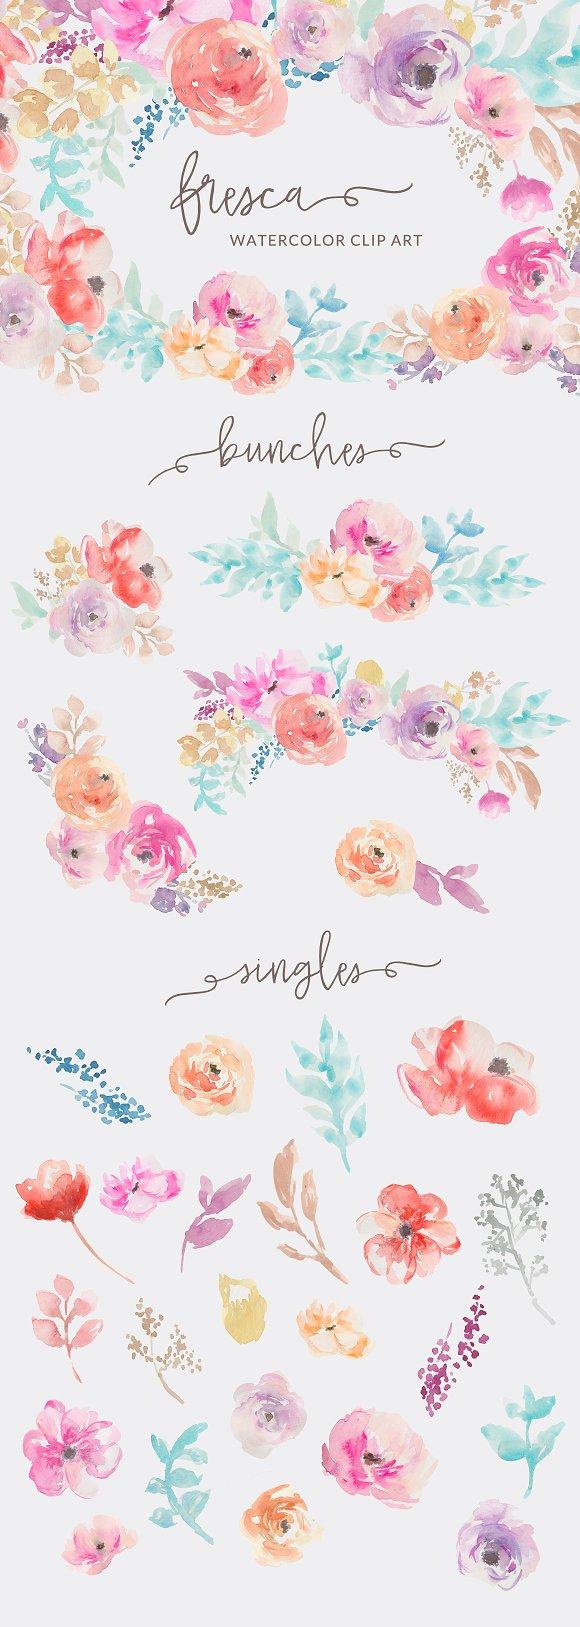 fresca watercolor flower clip art illustrations creative market